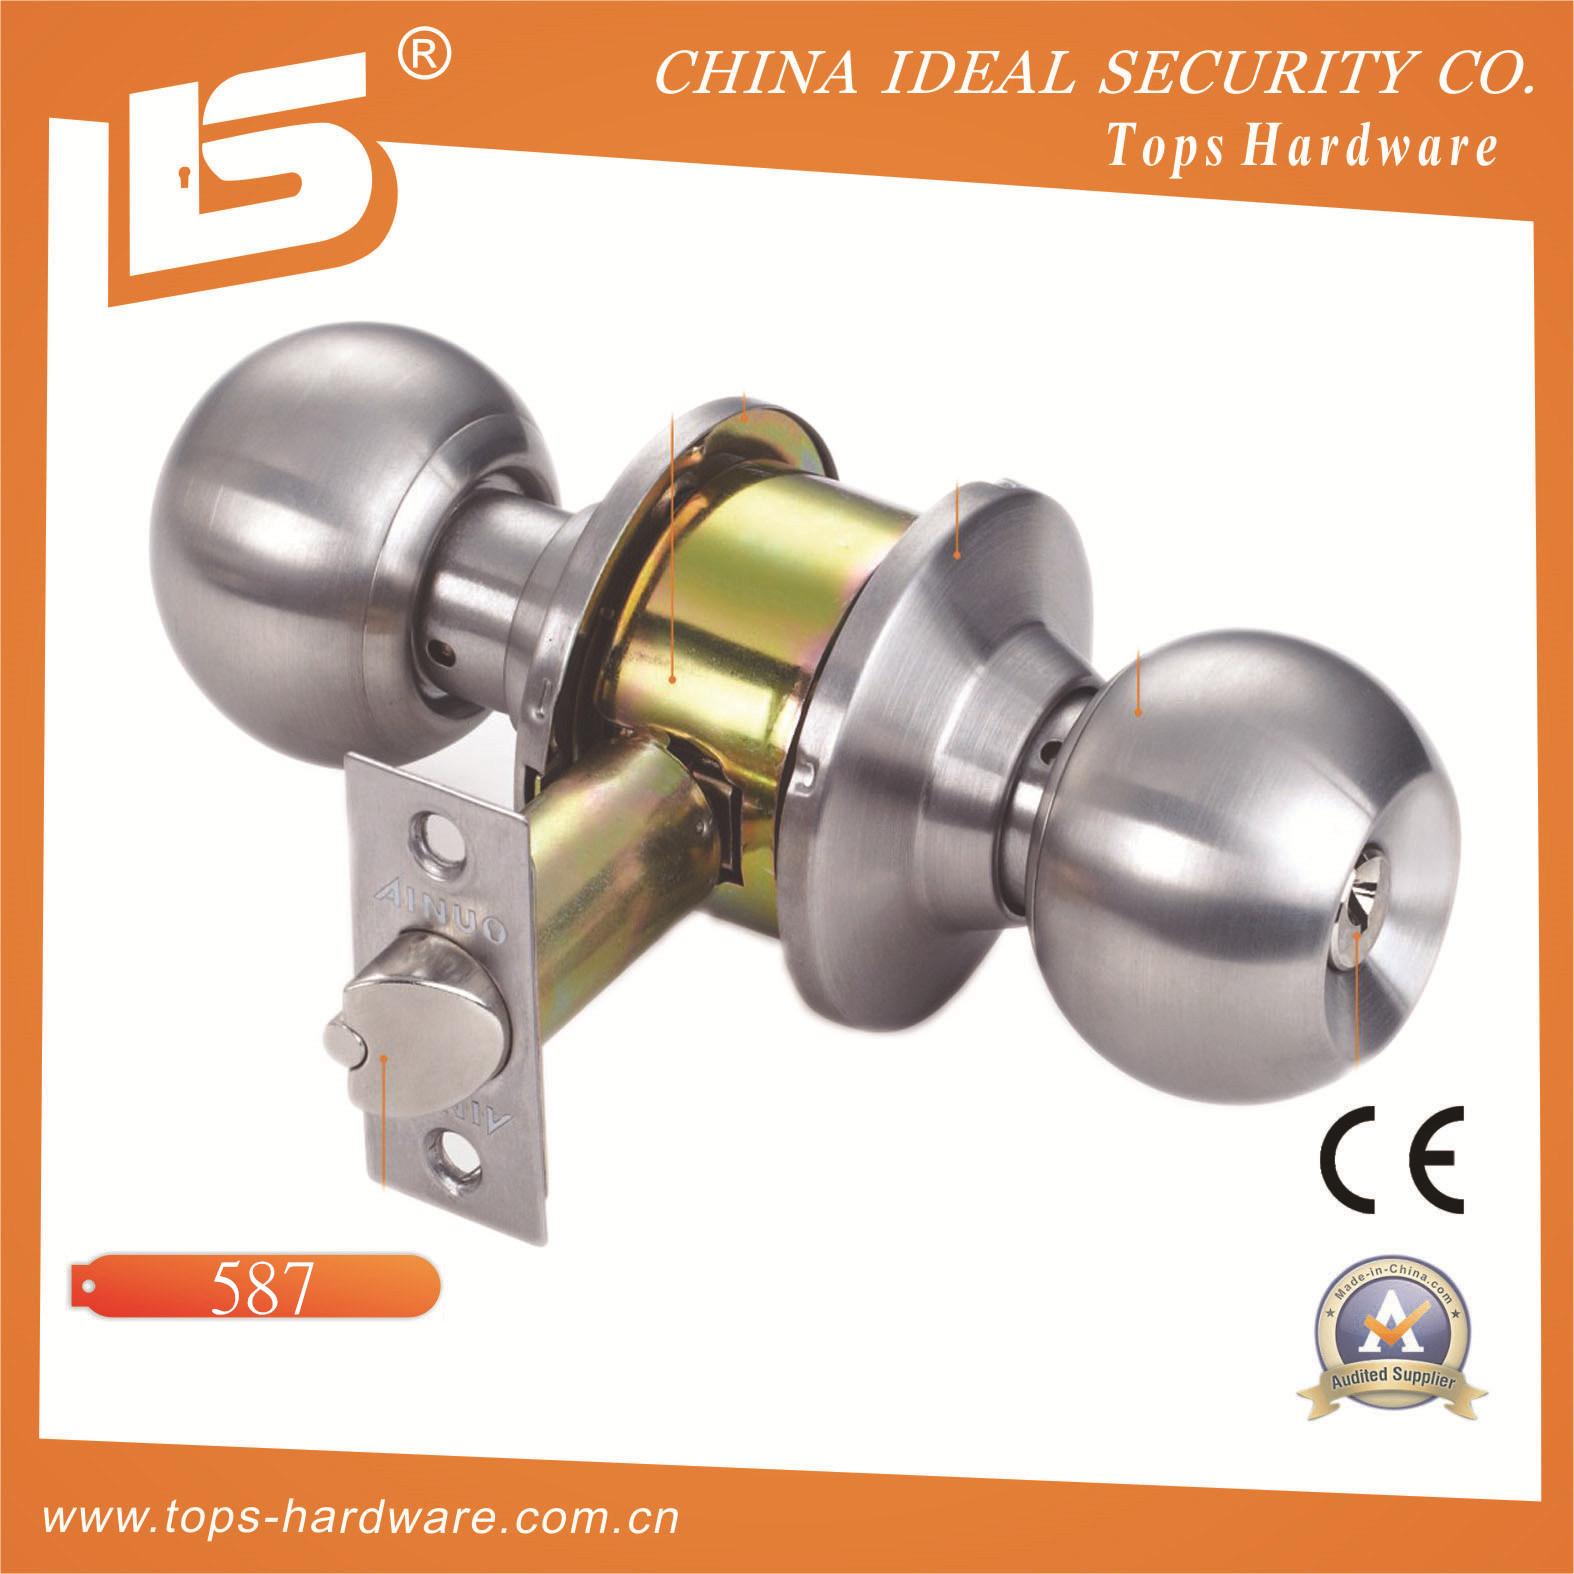 Cerradura clindrica tubular cerradura de pomo para la puerta 607 cerradura clindrica tubular - Cerraduras pomo para puertas ...